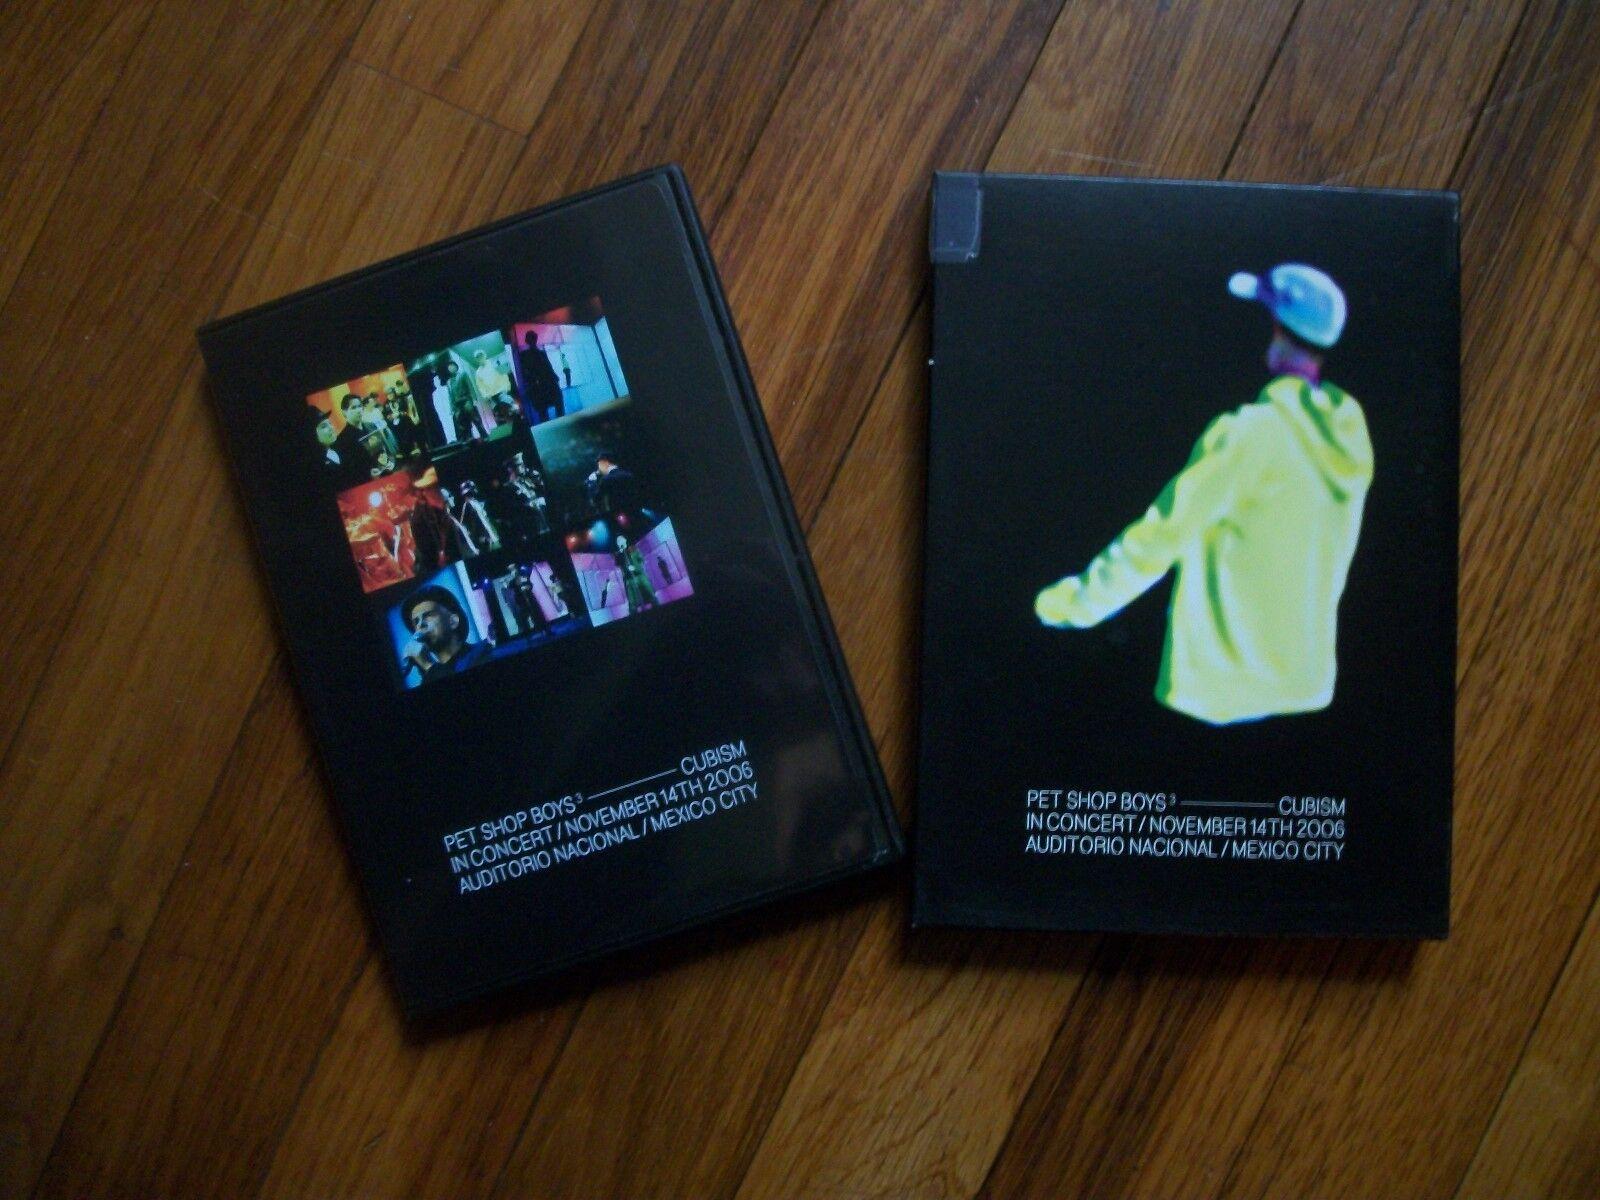 Купить PET SHOP BOYS----CUBISM IN CONCERT---NOVEMBER 14TH 2006  MEXICO CITY----DVD